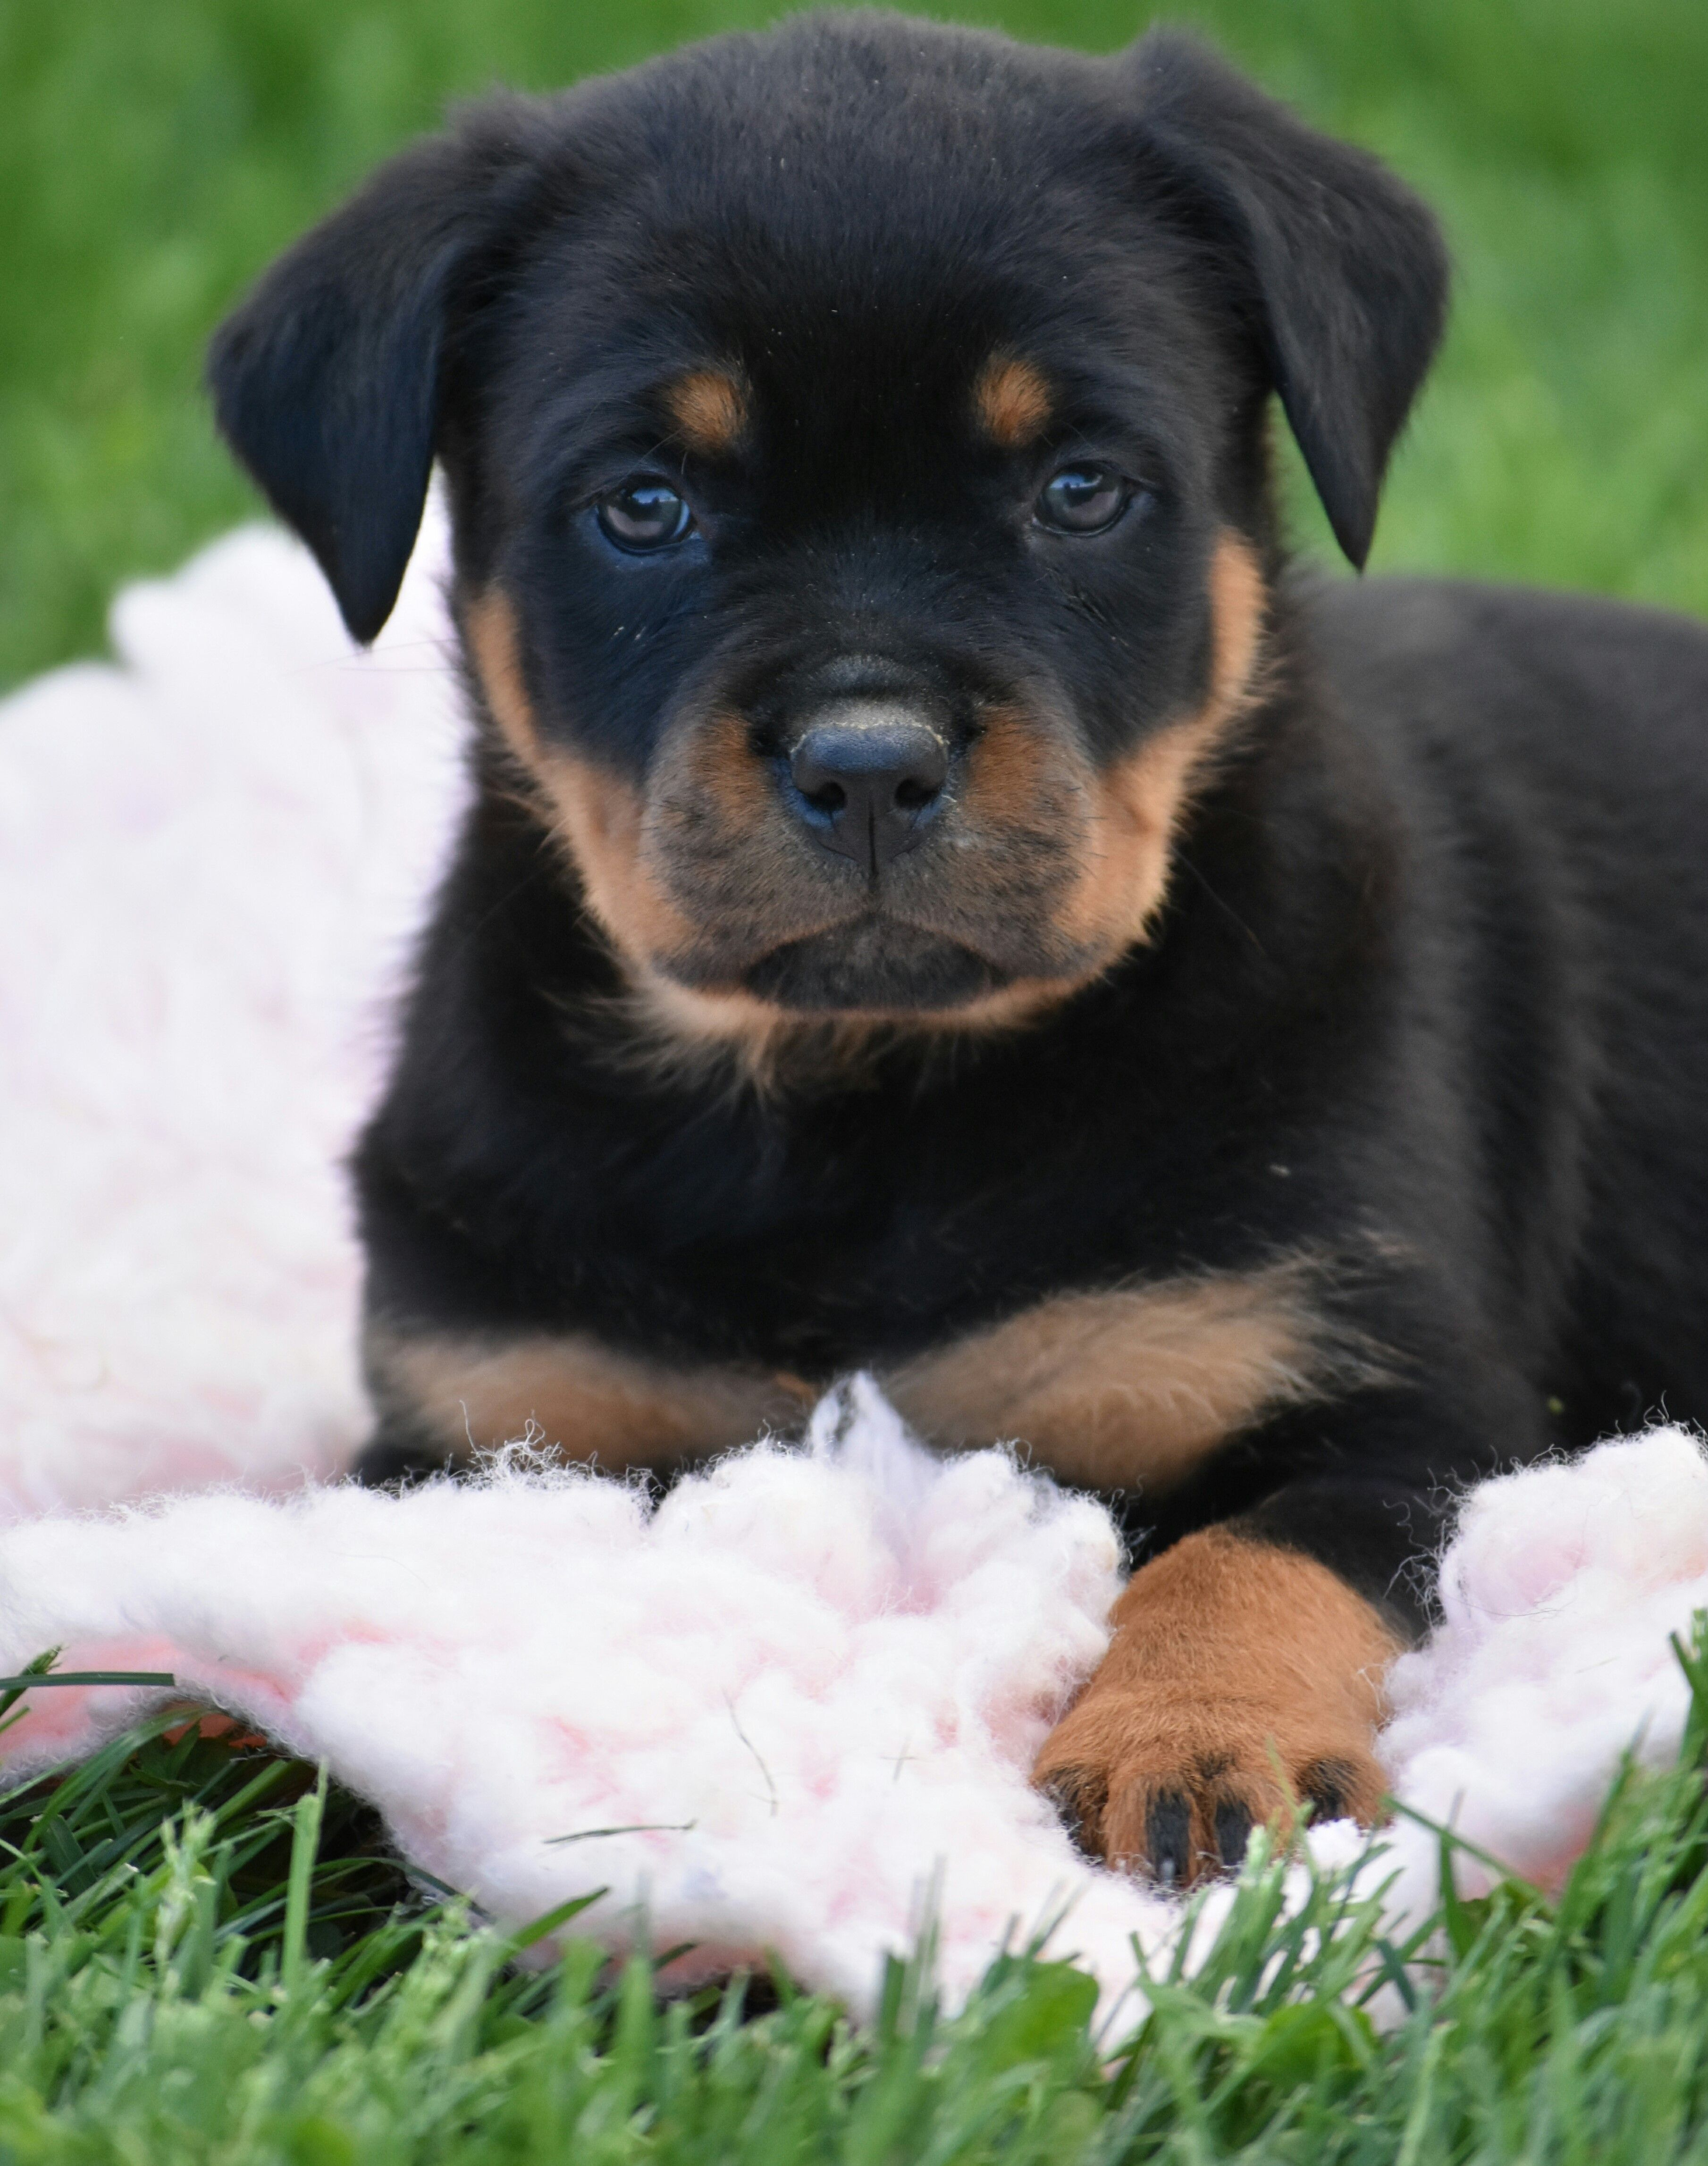 Brave Rottweiler Bulldog Breeds Rottweiler Puppies Rottweiler